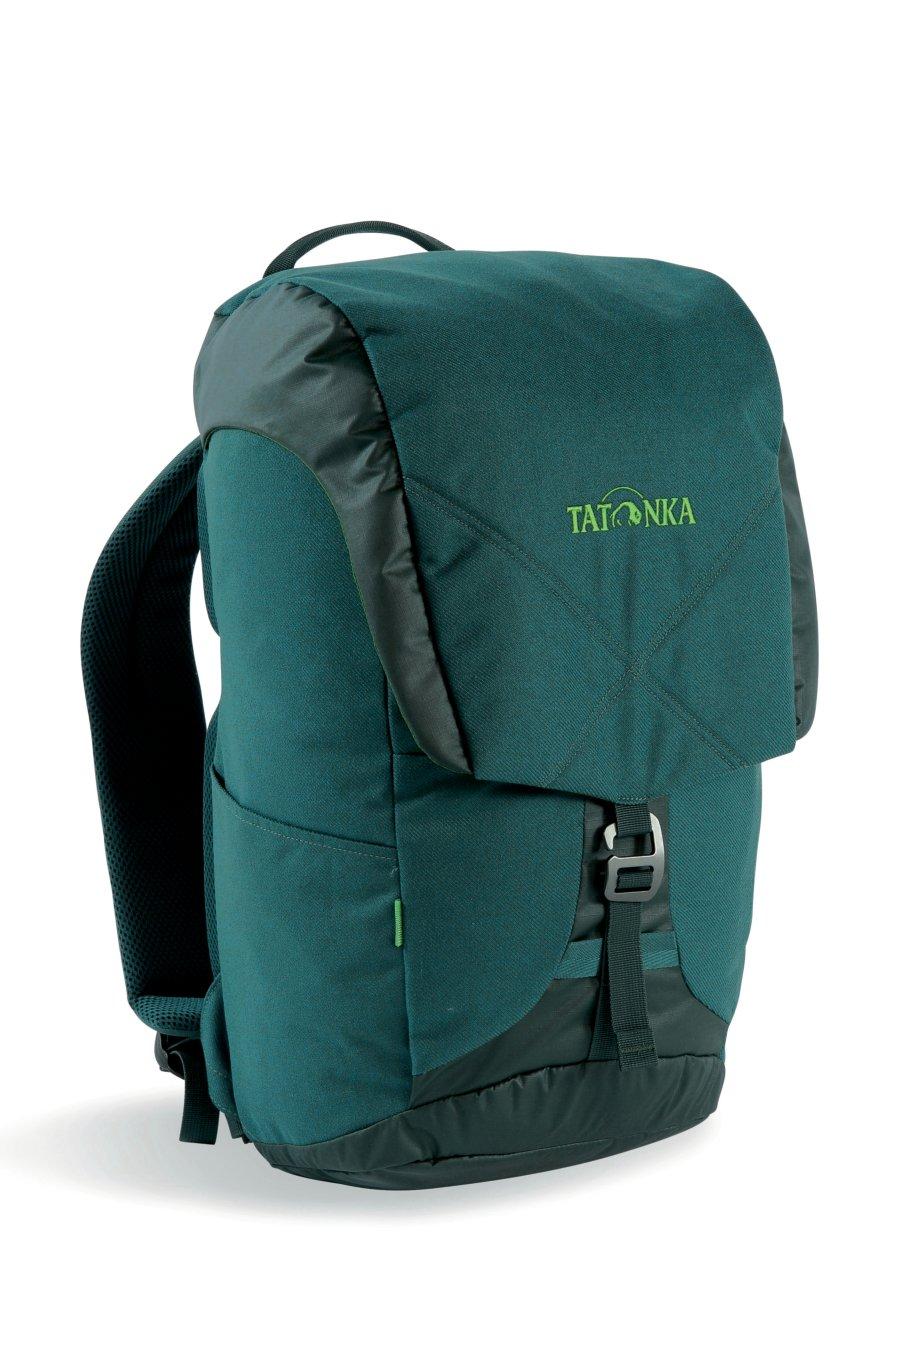 Tatonka Kema classic green-30